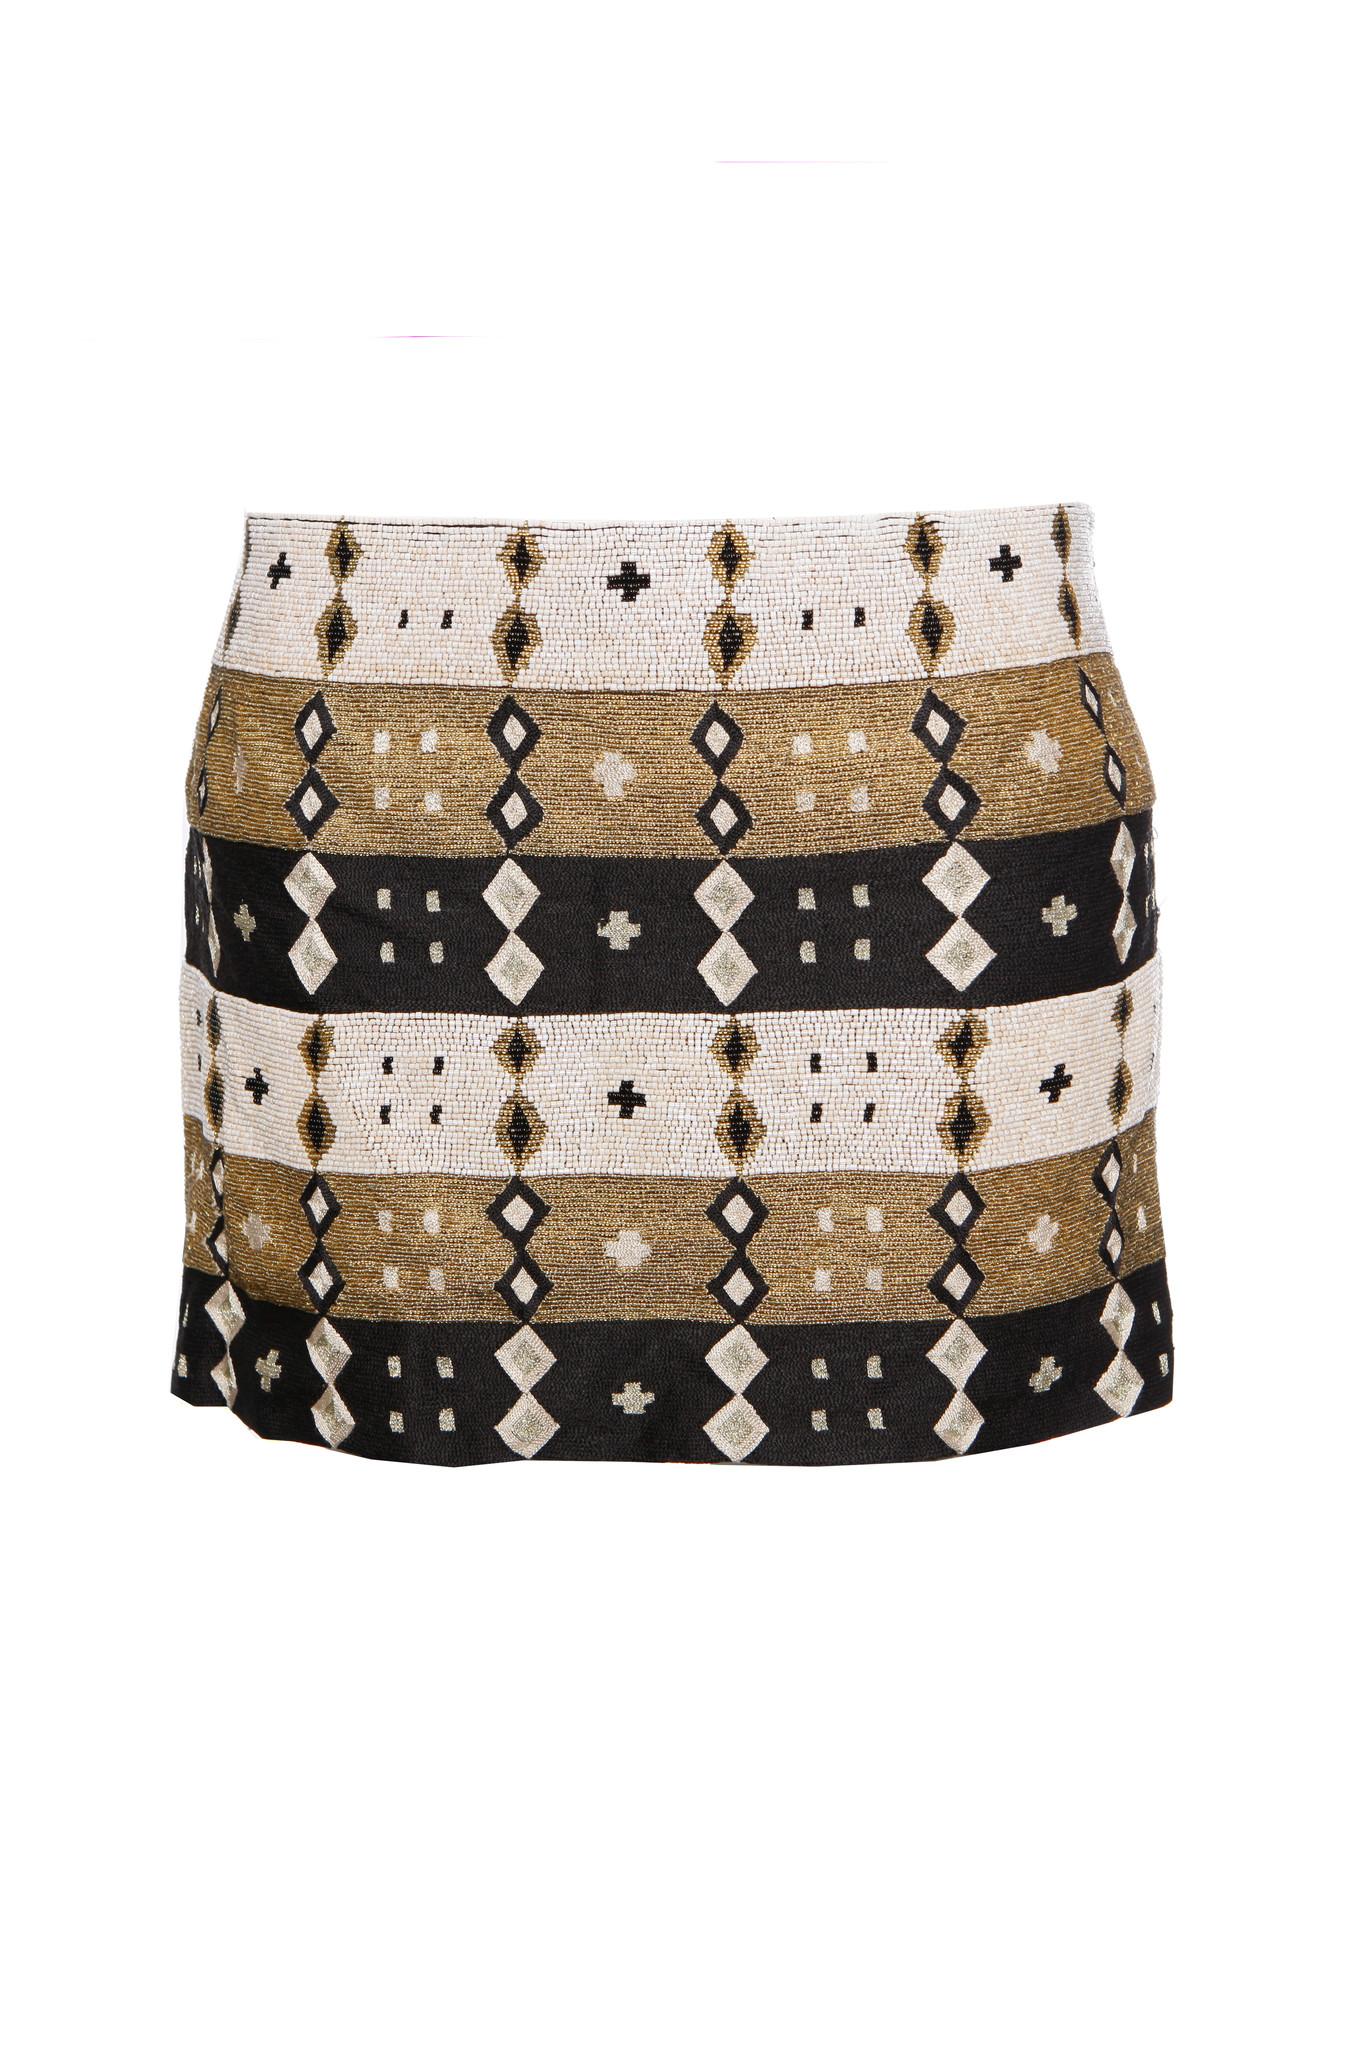 c8f71da188 Jasmine De Milo Jasmine Di Milo, Black/white/gold ethnic beaded skirt in ...